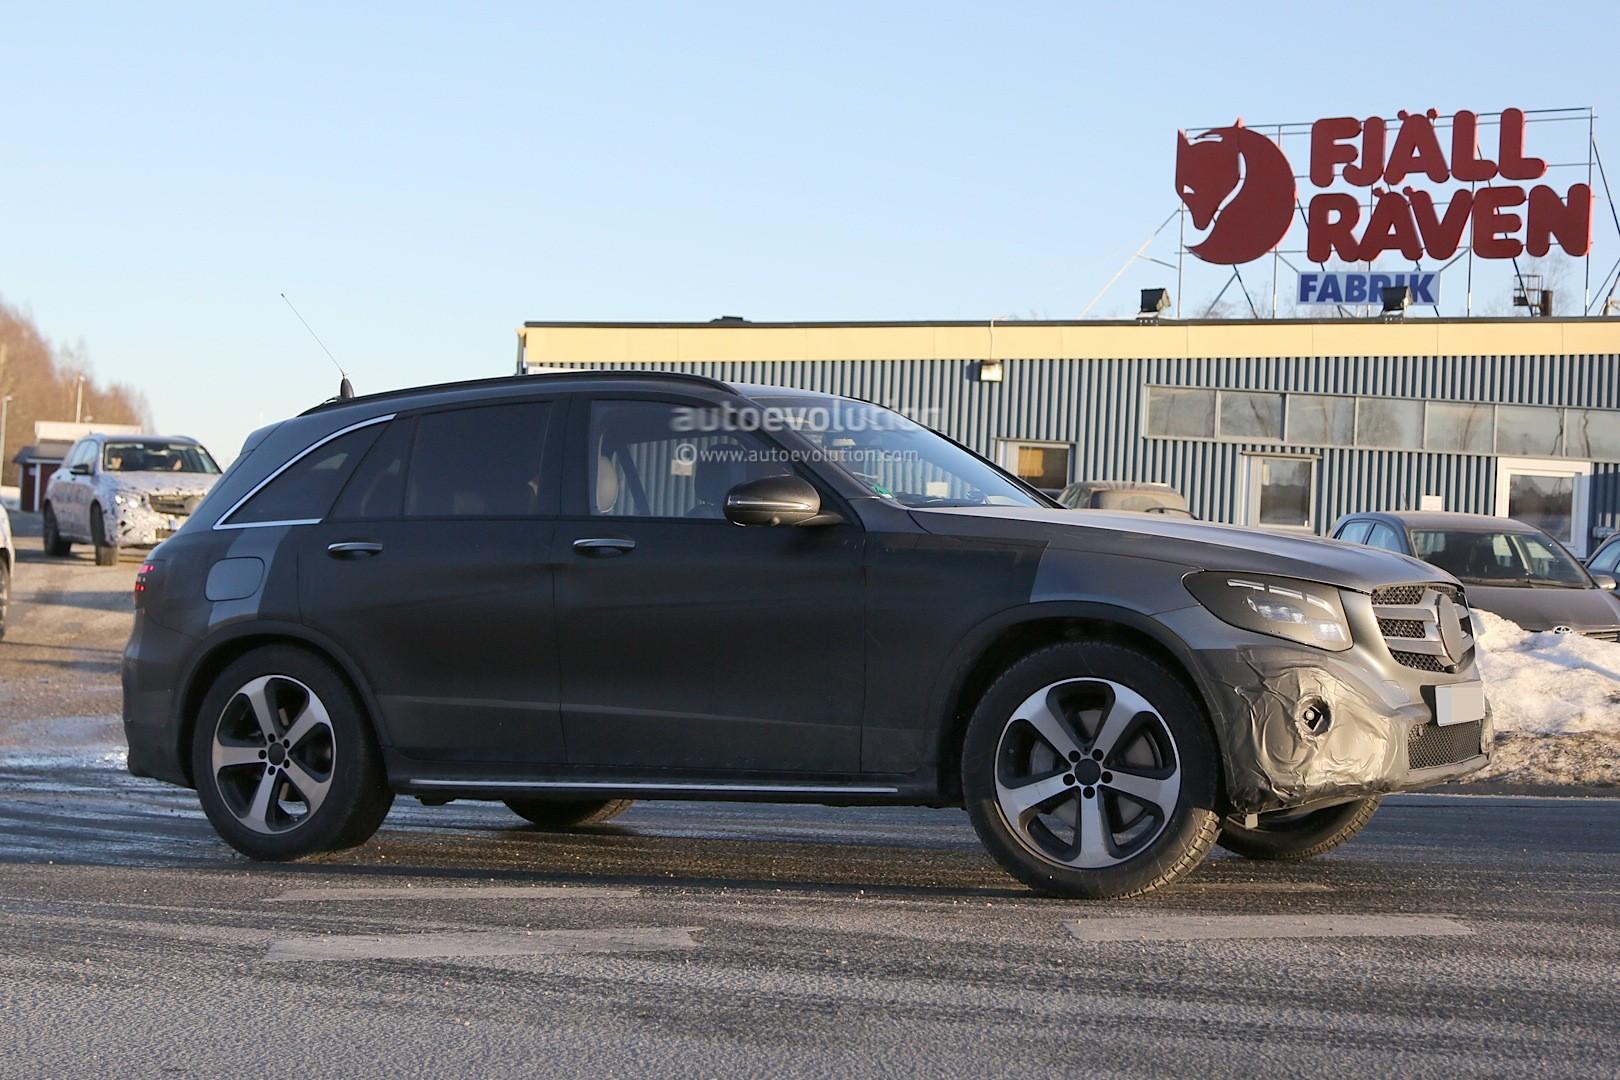 2015 - [Mercedes] GLC (GLK II) [X205] - Page 10 2016-mercedes-glc-spy-photos-show-nearly-undisguised-pre-production-prototypes_23